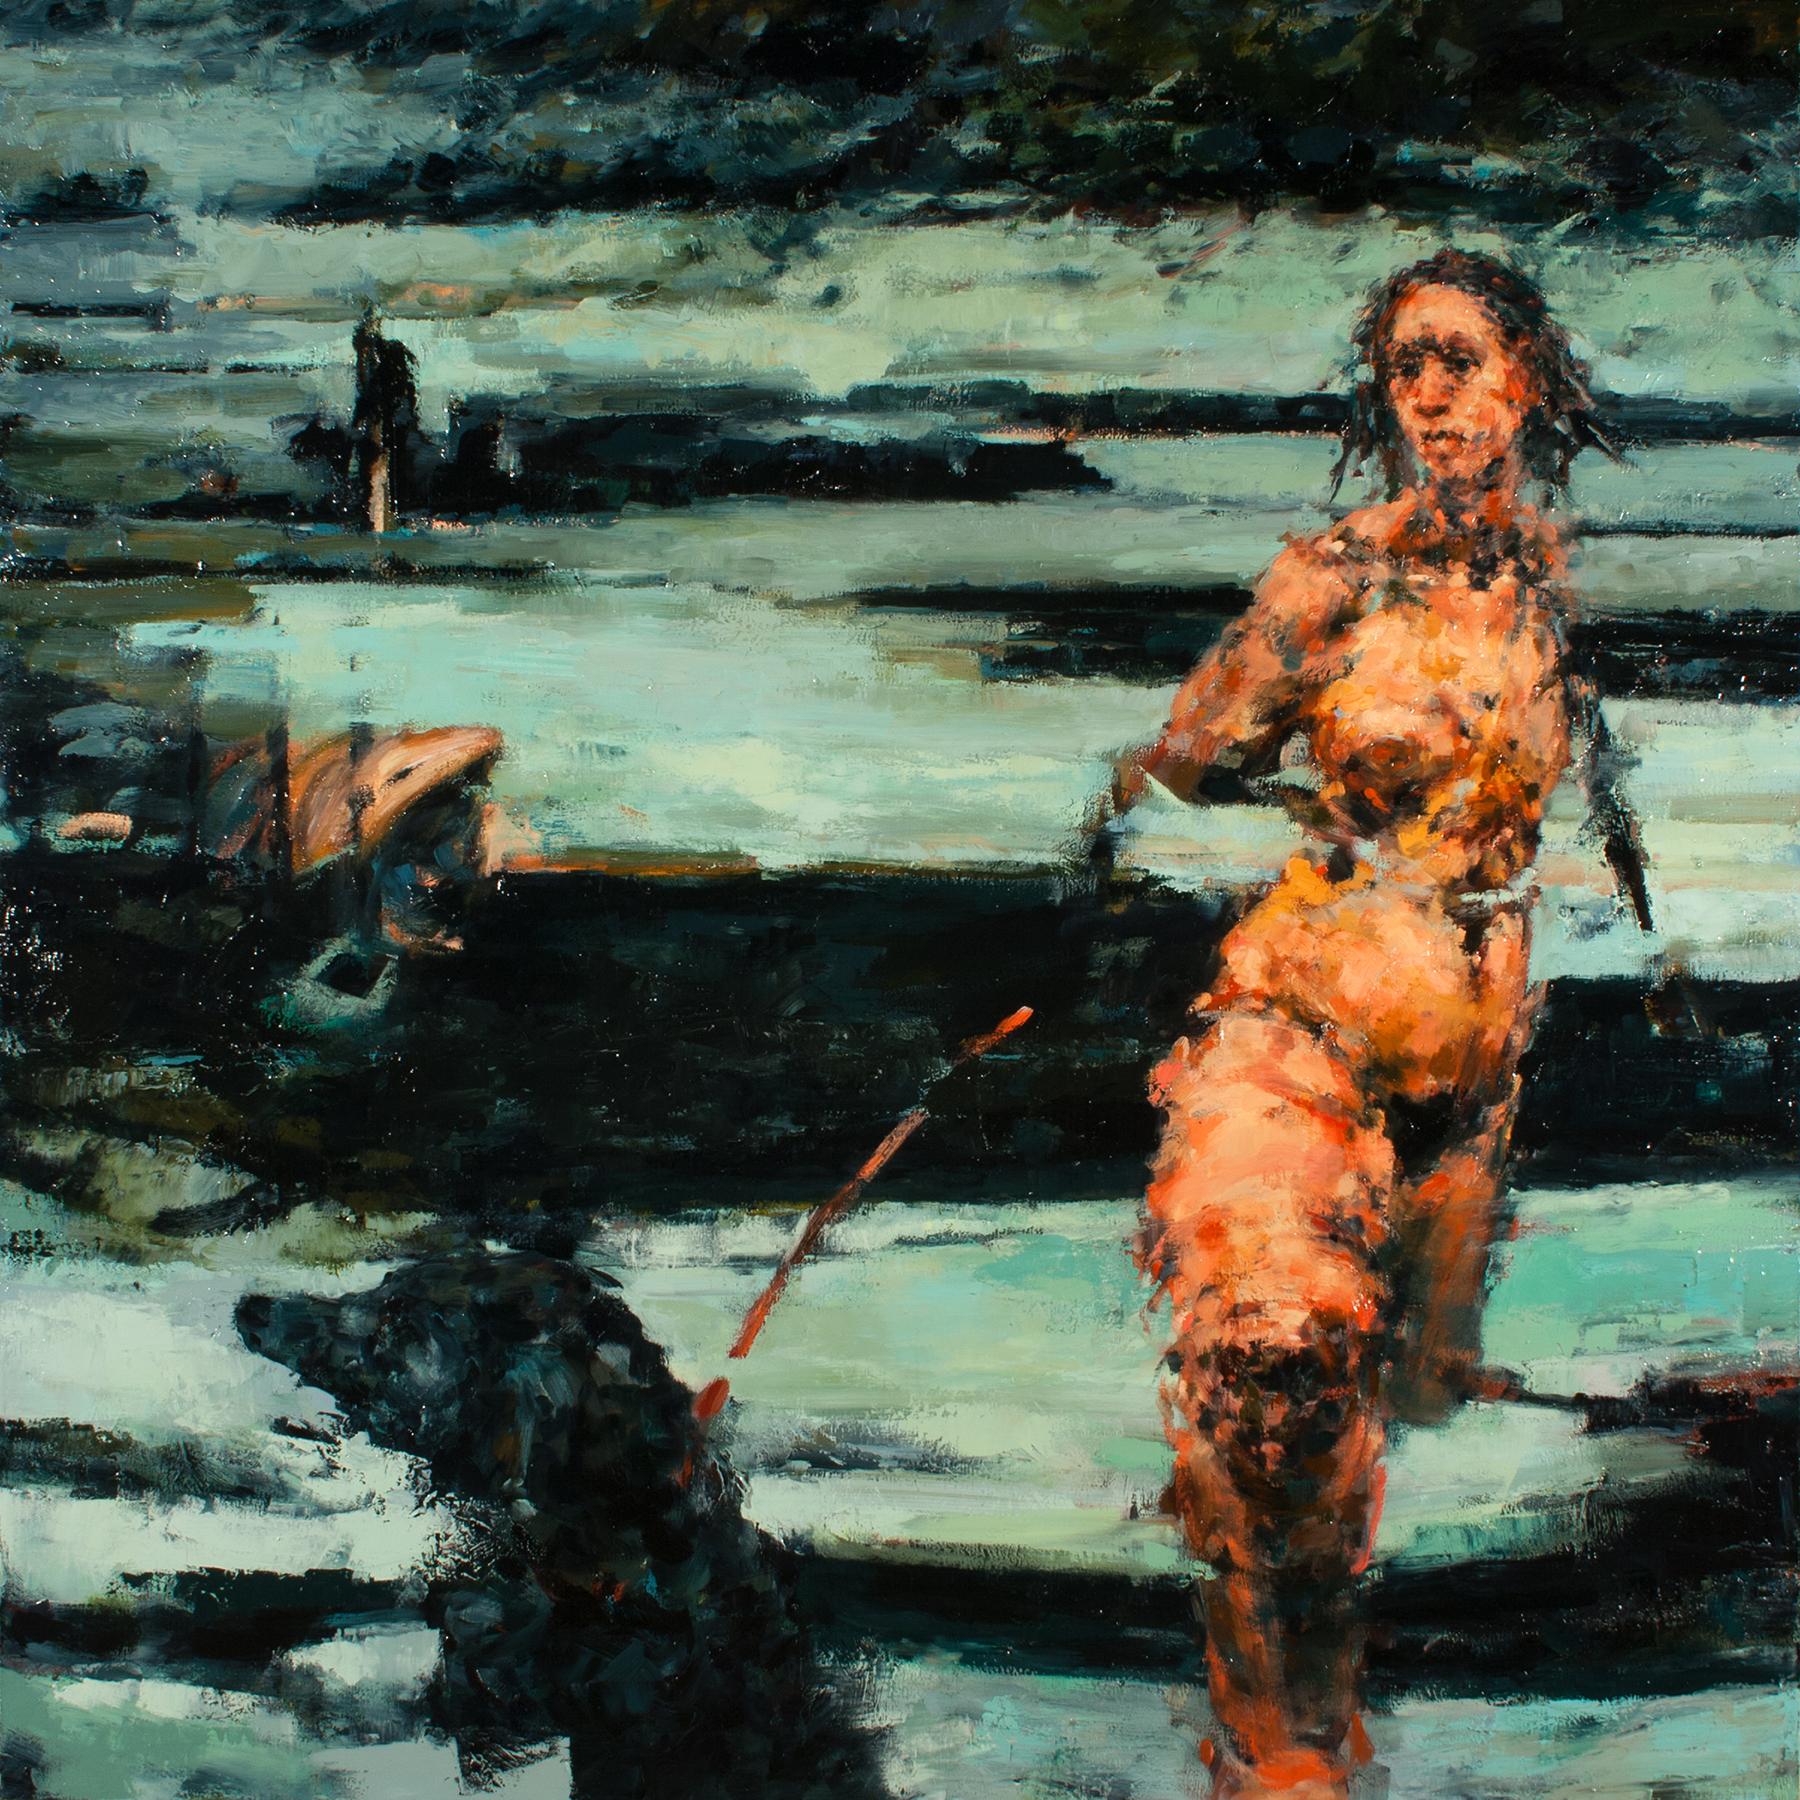 "Protector, oil on canvas, 42"" x 42"" x 2"", 2014"